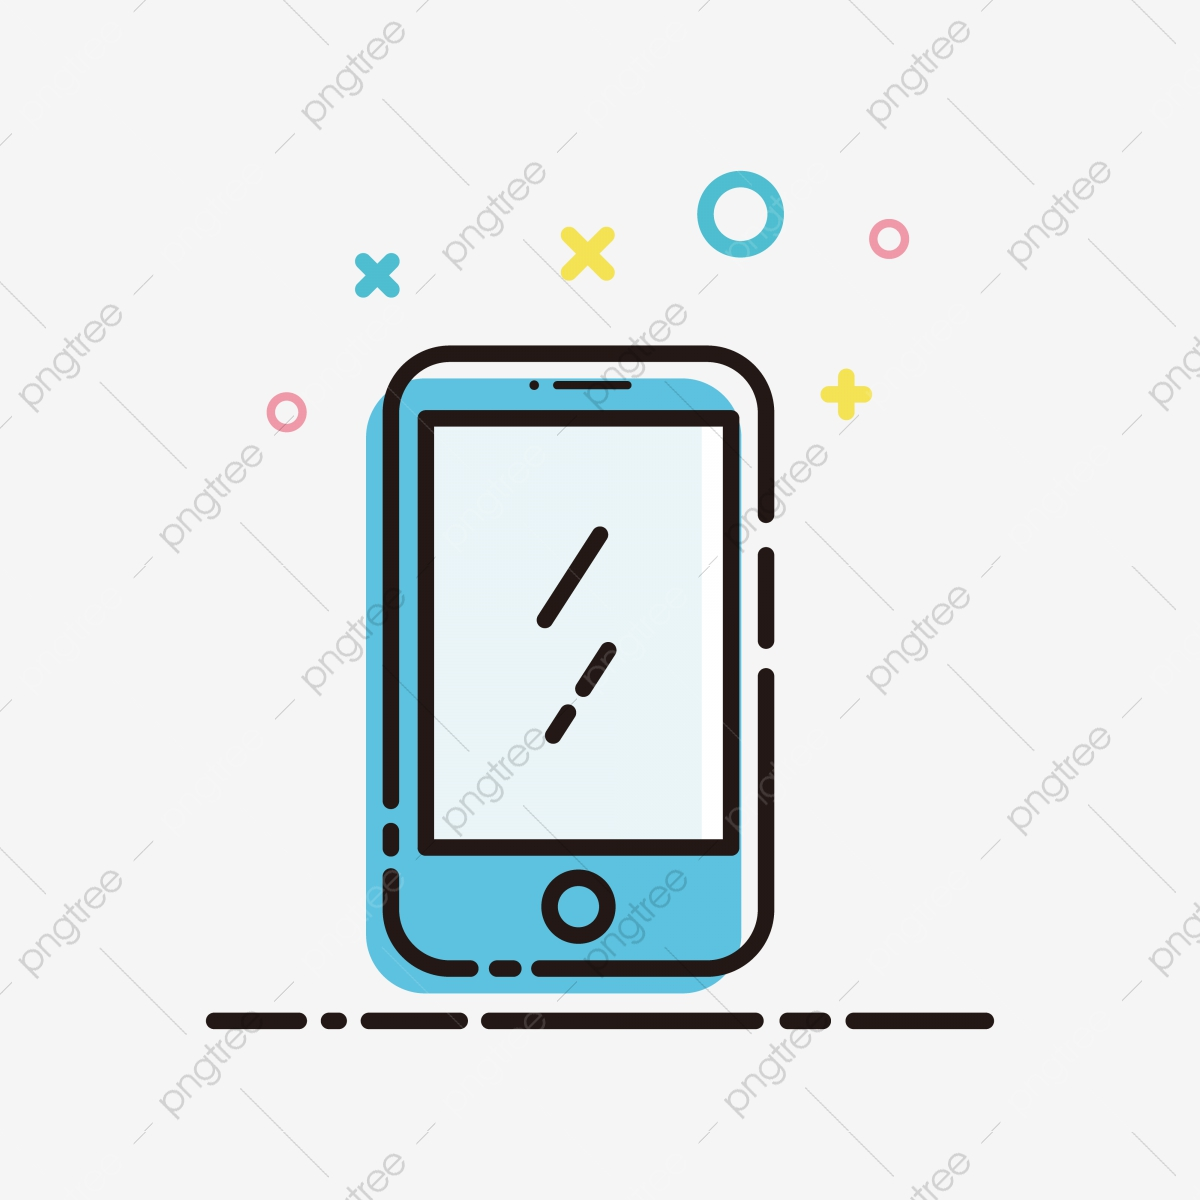 bc79e534ef9 高清 IPhone X IPhone X Apple X Imagen PNG para Descarga gratuita